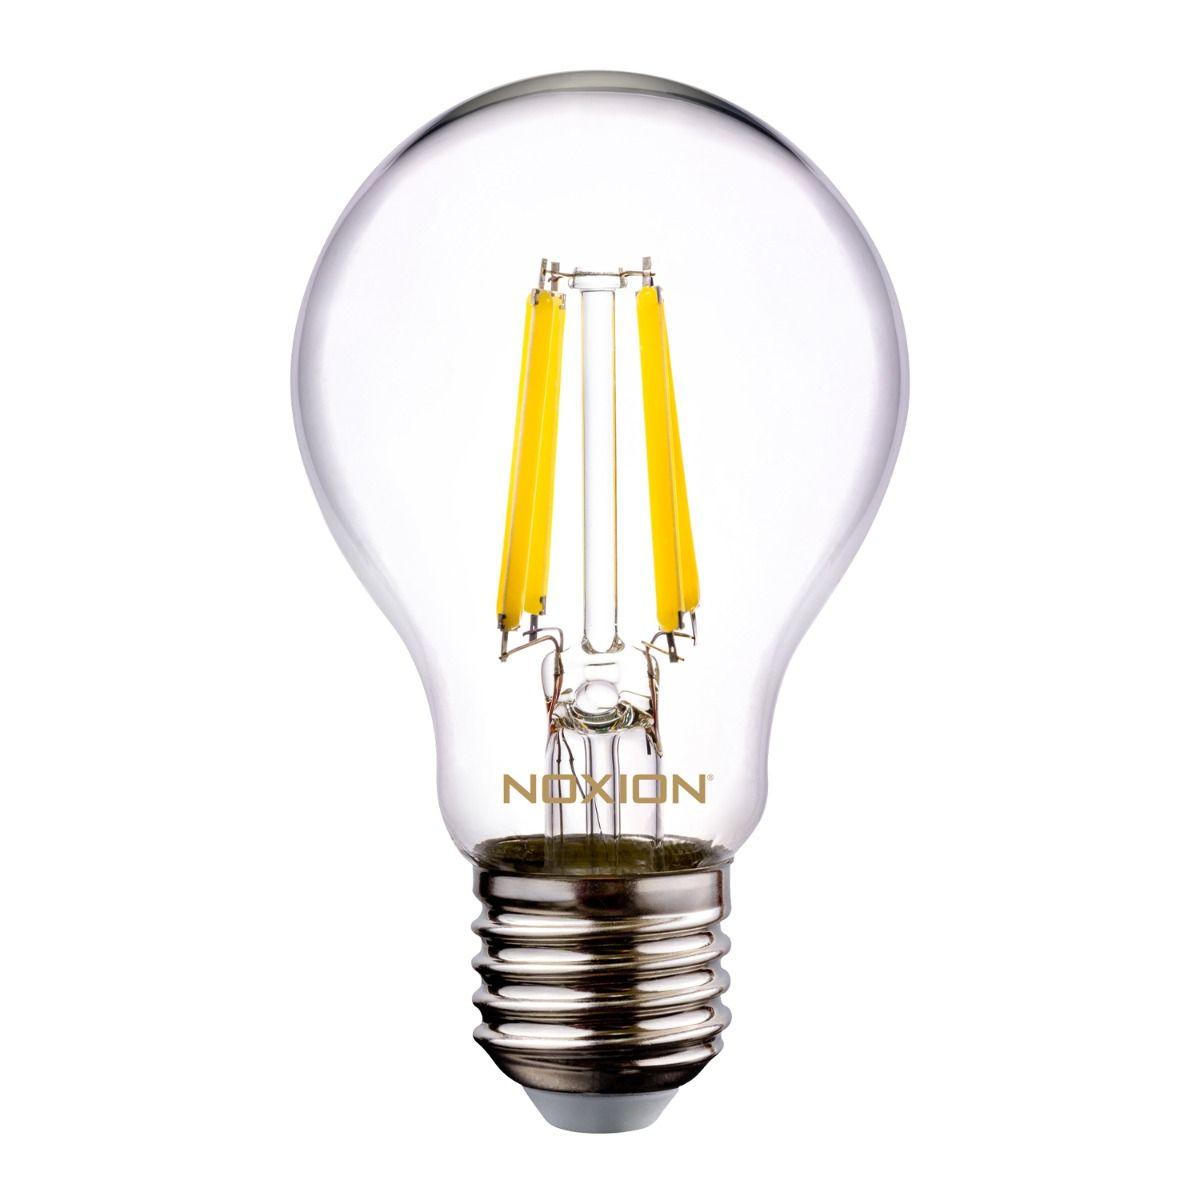 Noxion Lucent Fadenlampe LED Bulb A60 E27 220-240V 7W 806LM CRI80 4000K ND (60W eqv.)